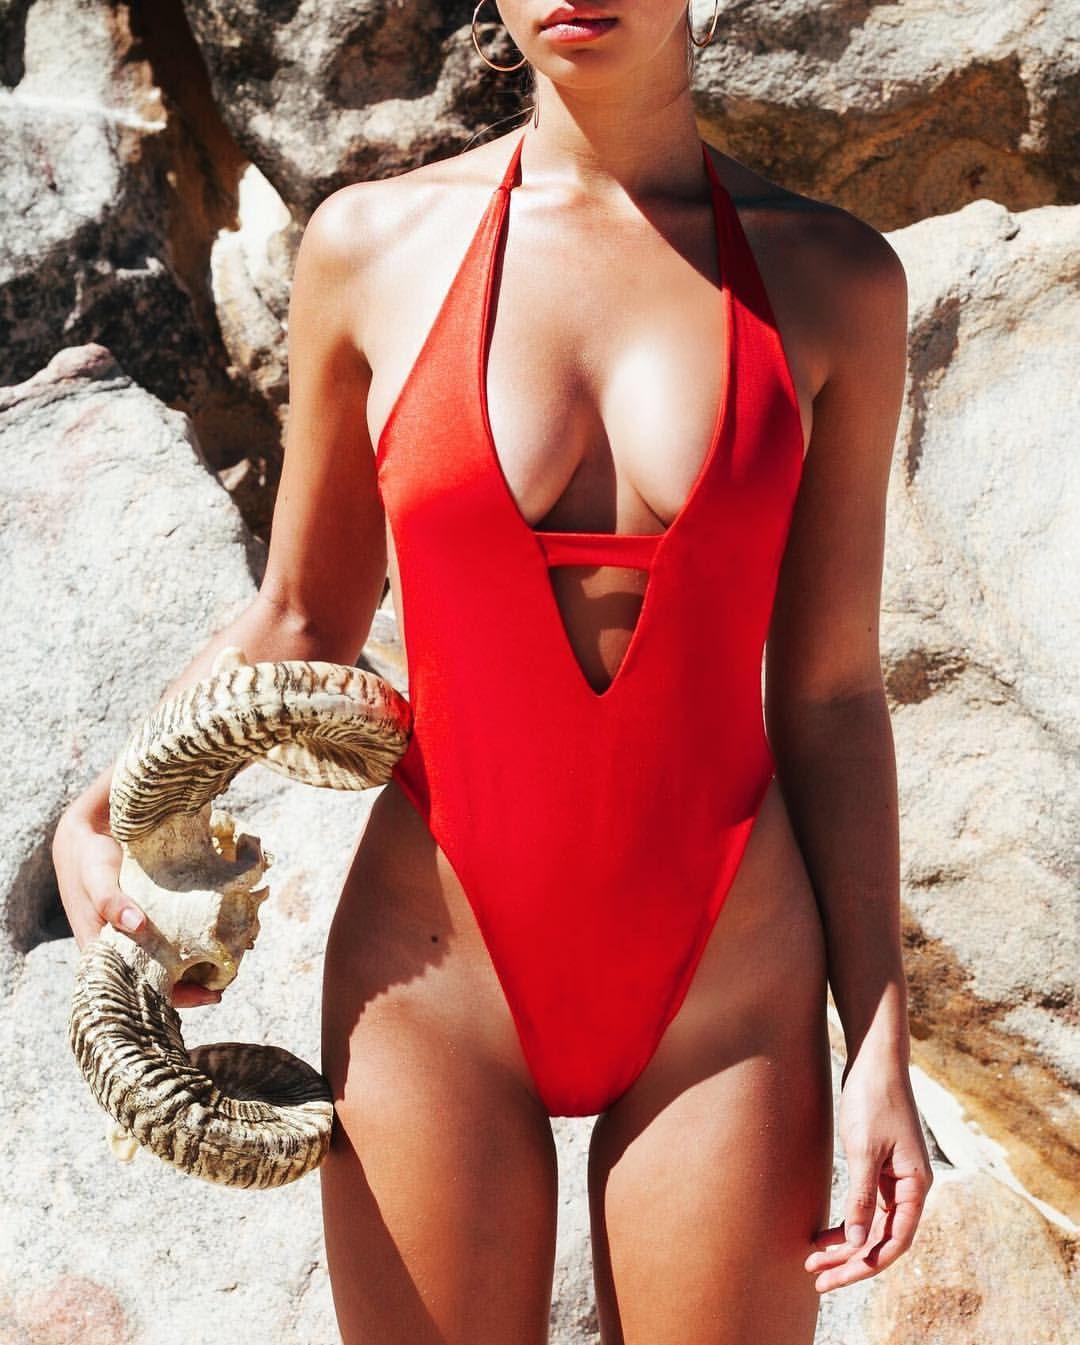 Pictures Avital Cohen nudes (69 photos), Topless, Paparazzi, Selfie, panties 2015